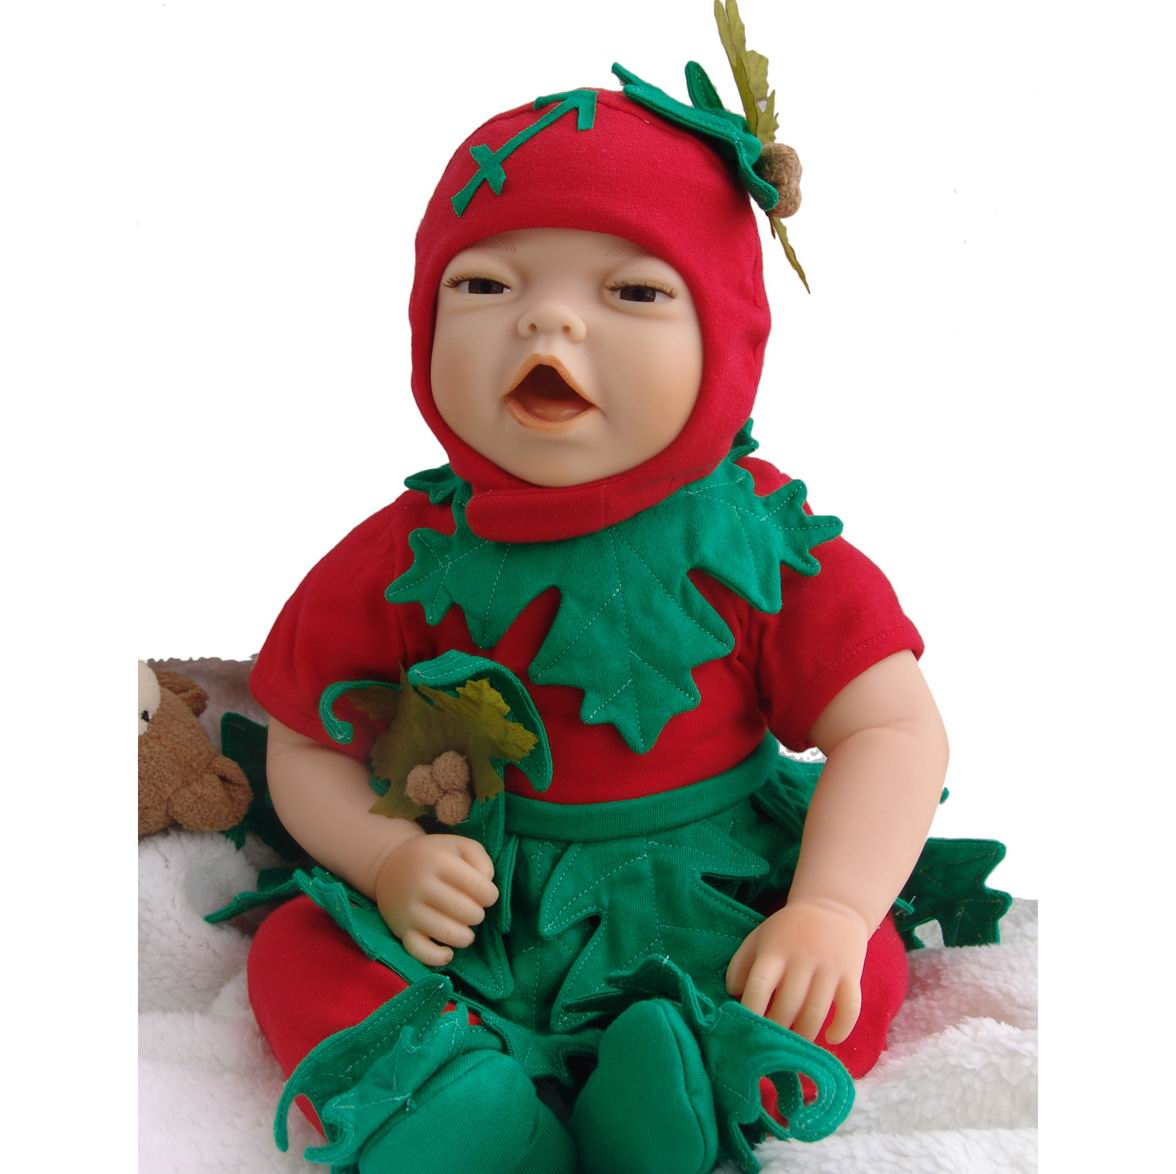 silicone baby boy dolls,asian hot baby doll,doll just born - buy